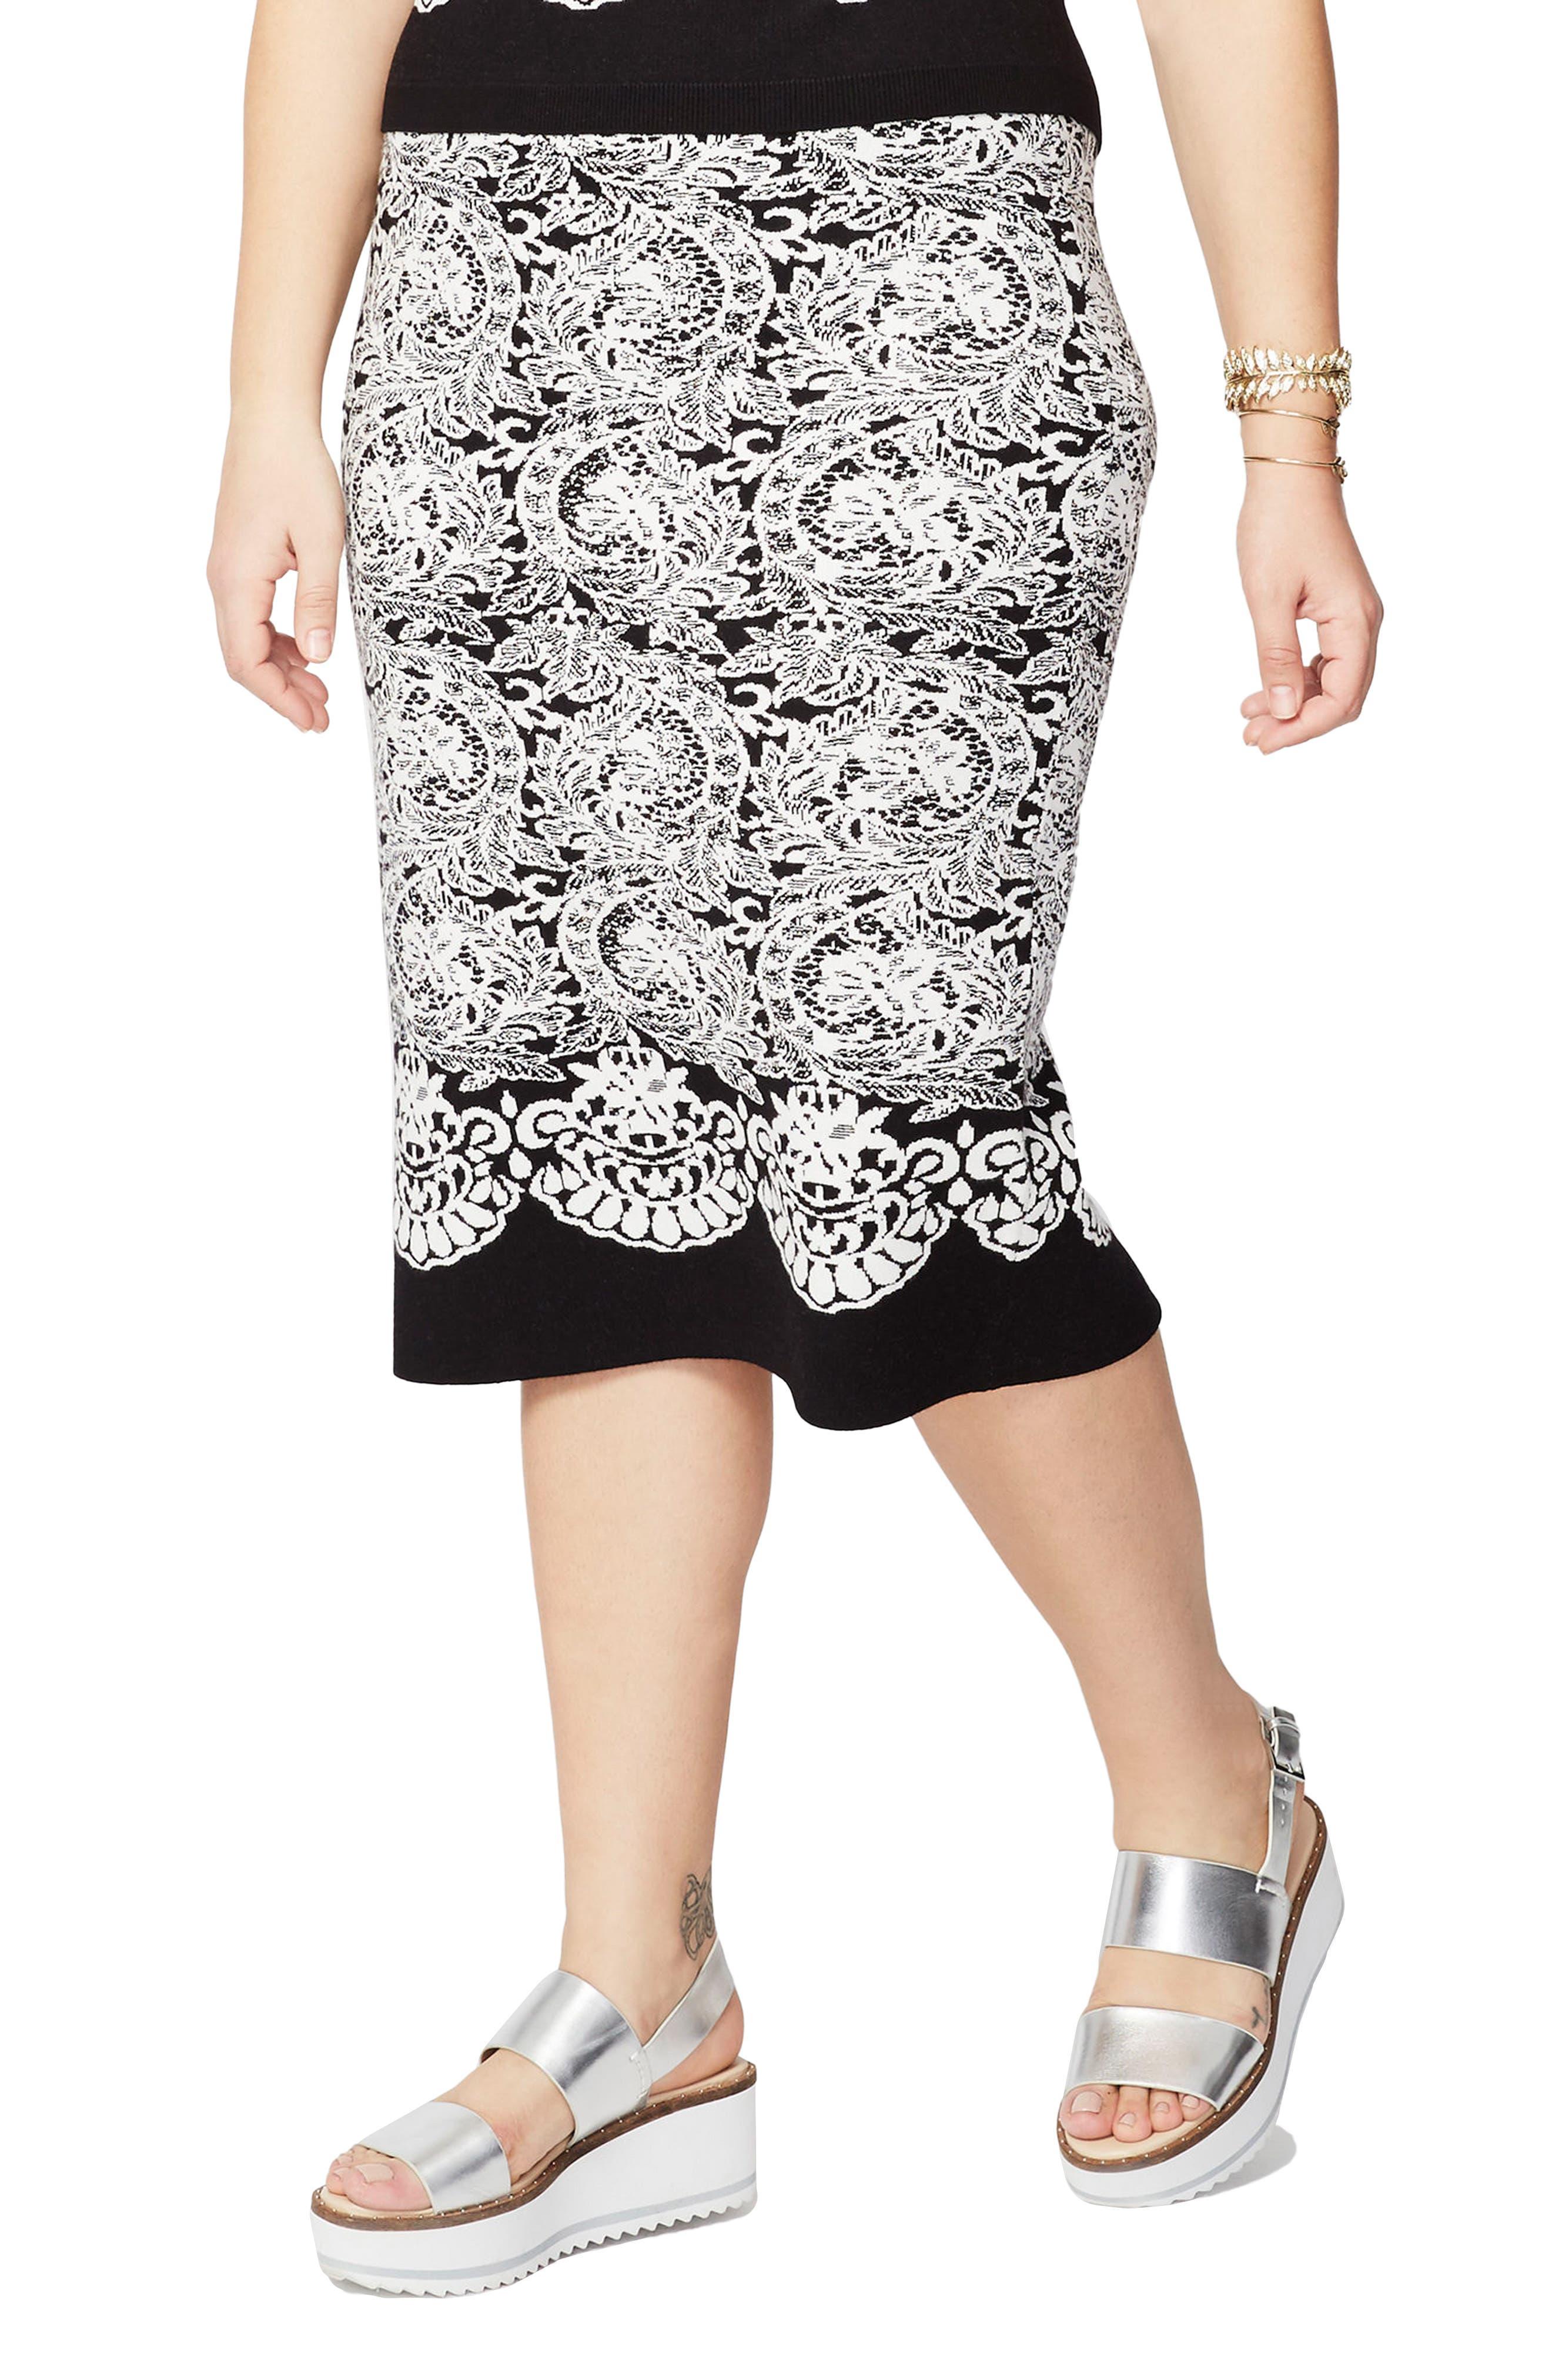 Alternate Image 1 Selected - RACHEL Rachel Roy Floral Jacquard Skirt (Plus Size)